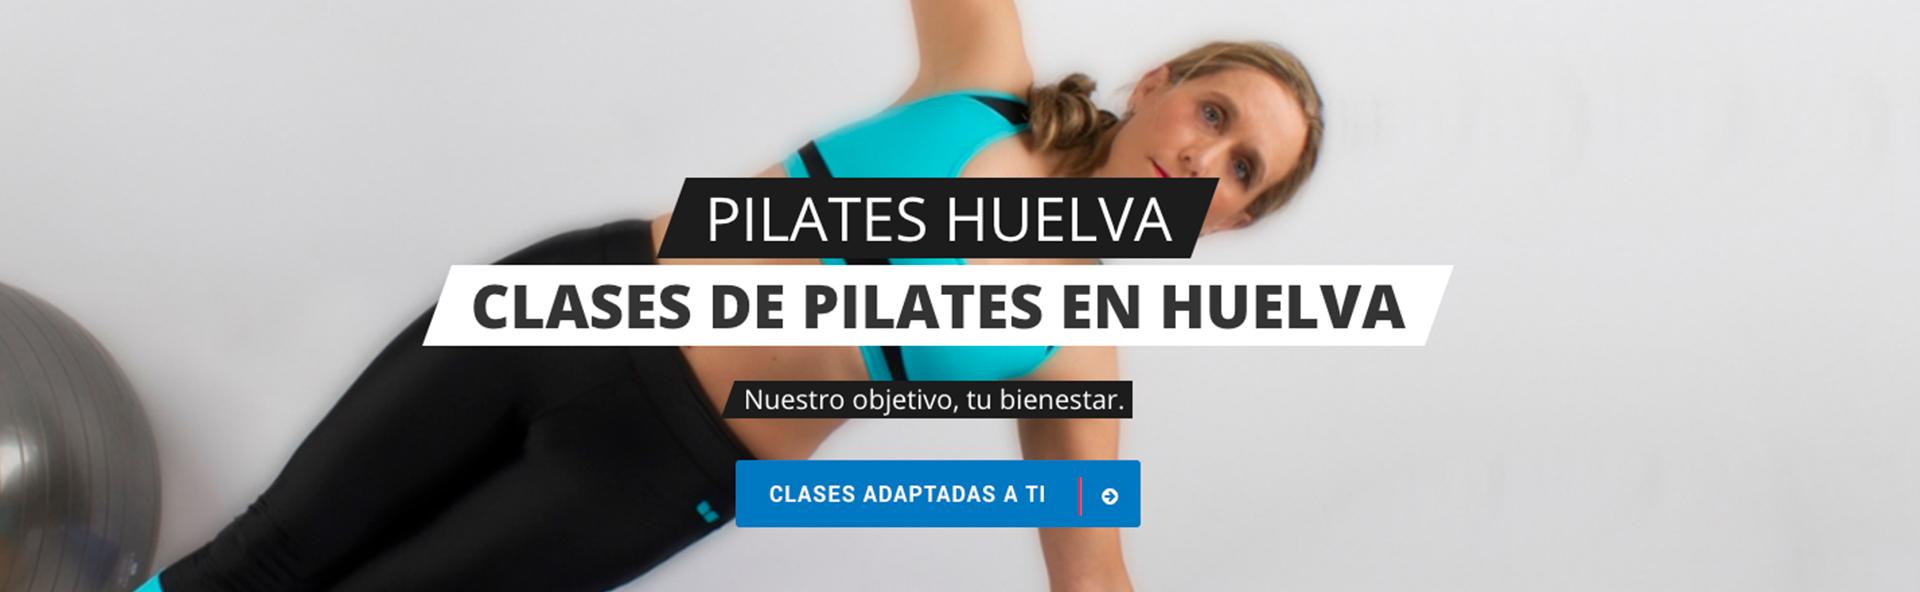 Pilates Huelva